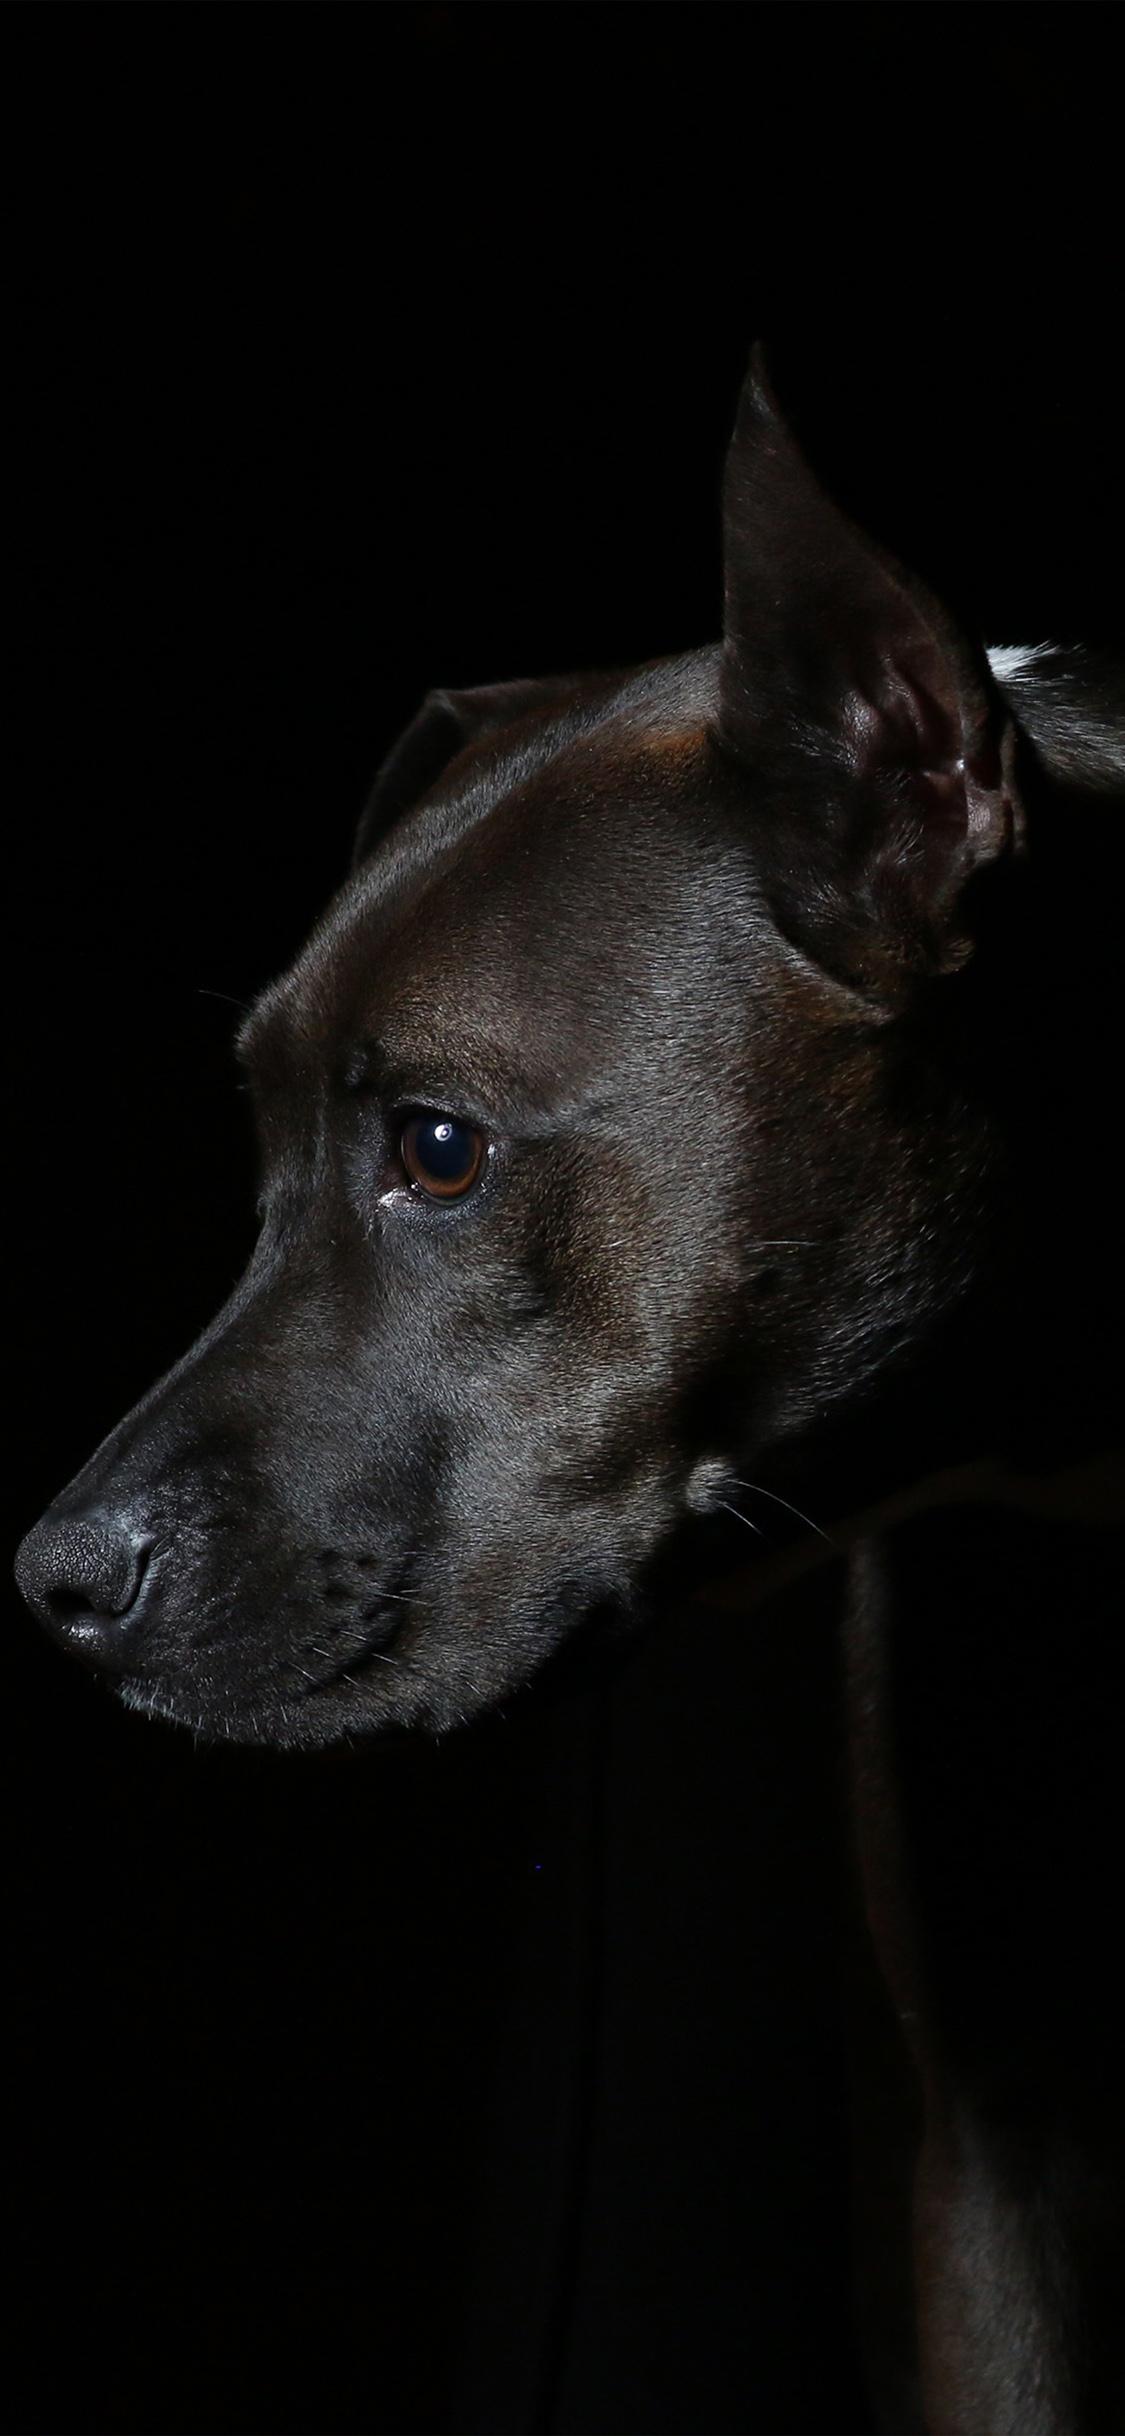 Iphonexpapers Com Iphone X Wallpaper Nj37 Dog Dark Animal